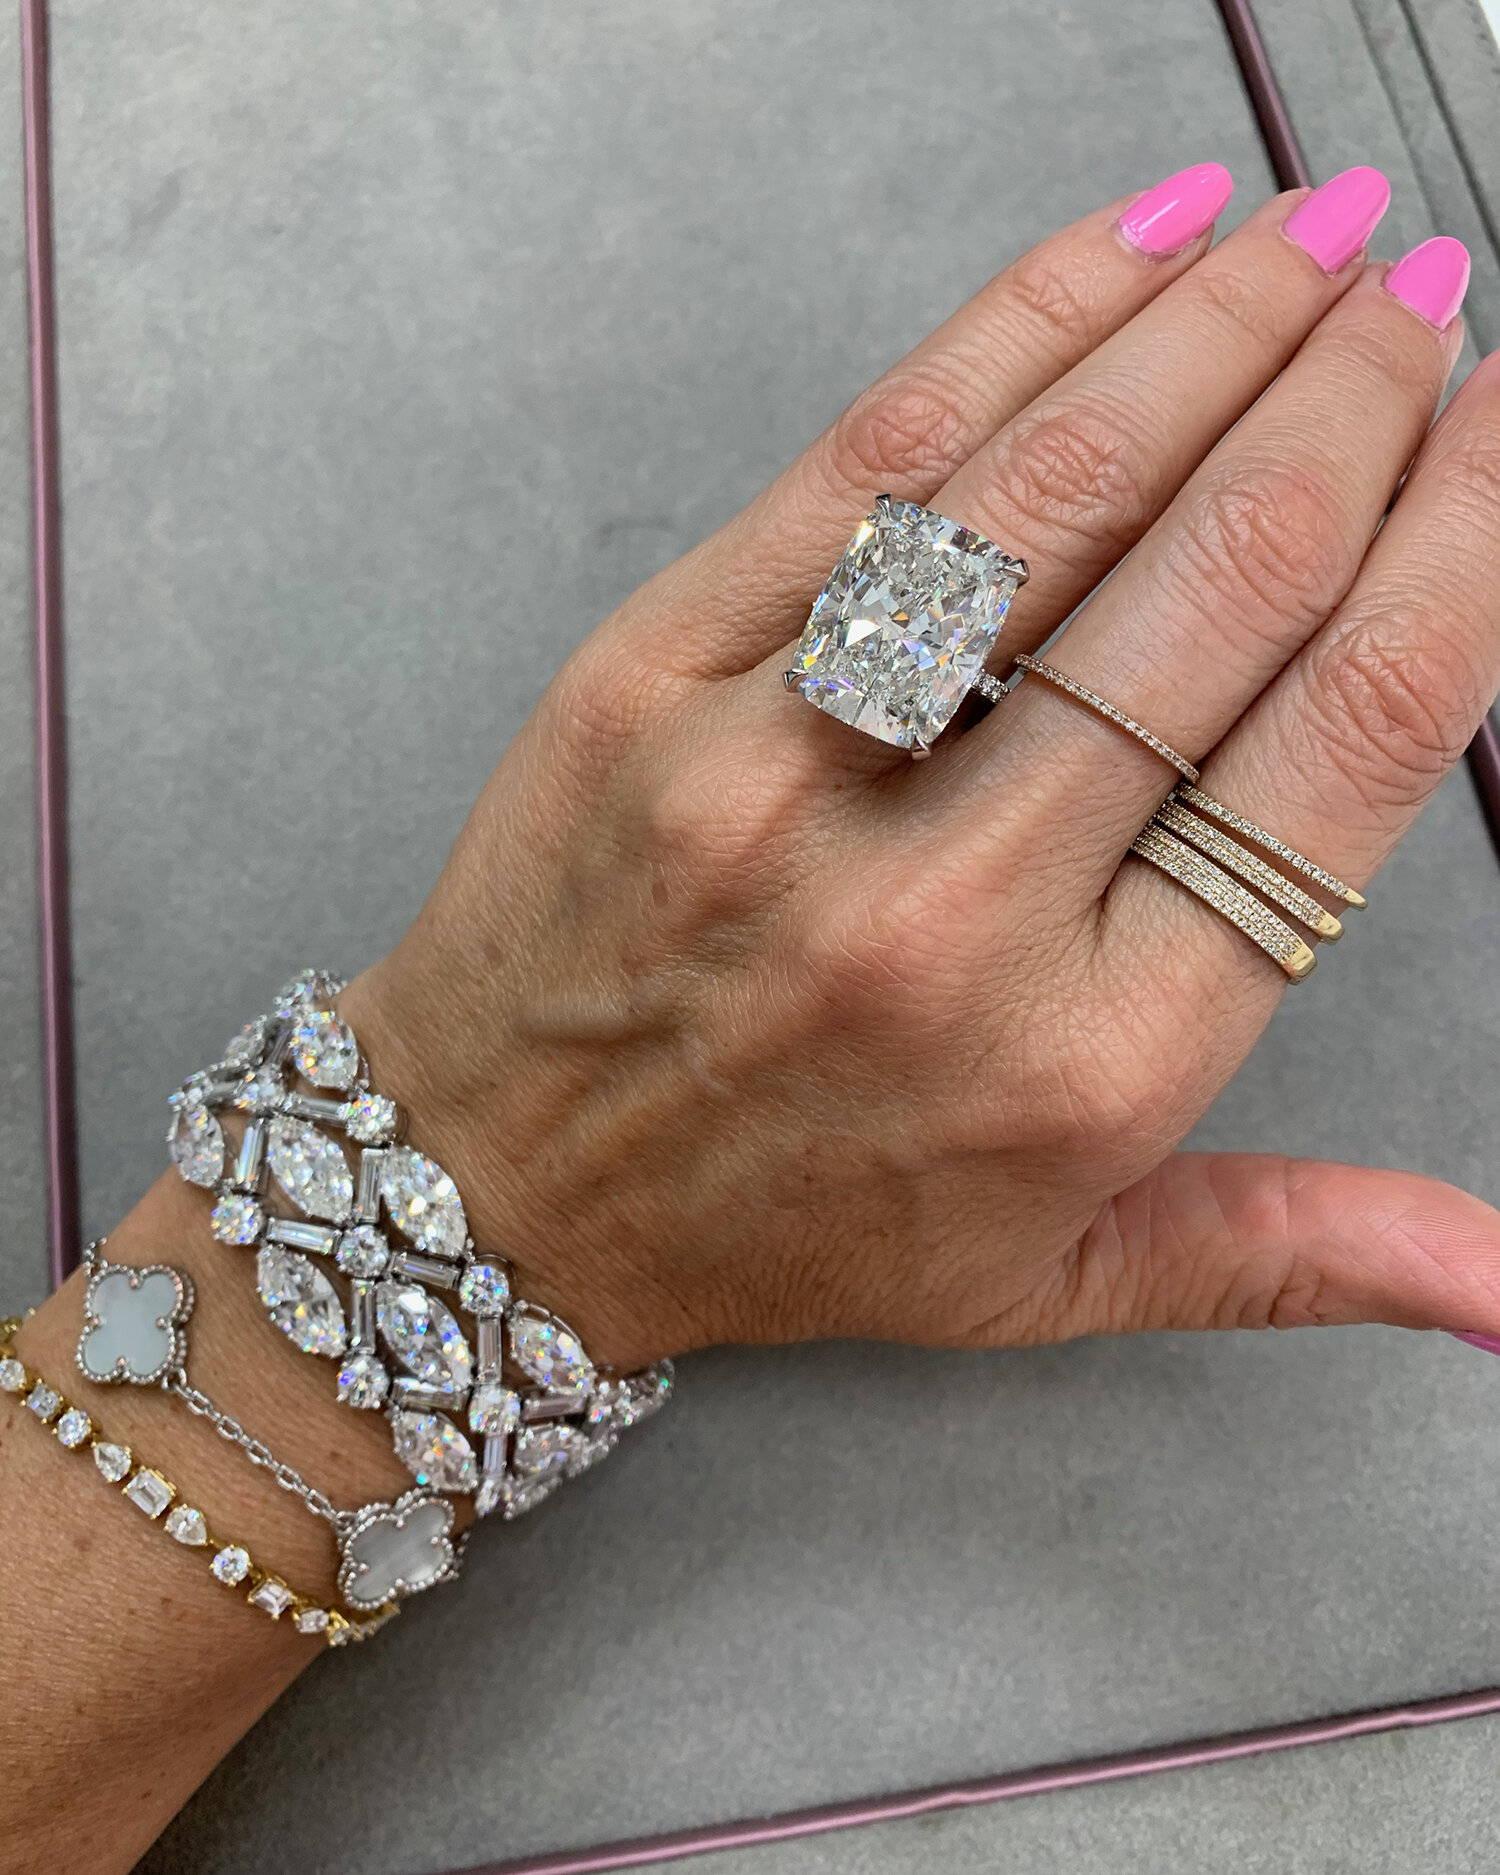 Miss Diamond Ring 10 Carat Radiant Diamond Engagement Ring